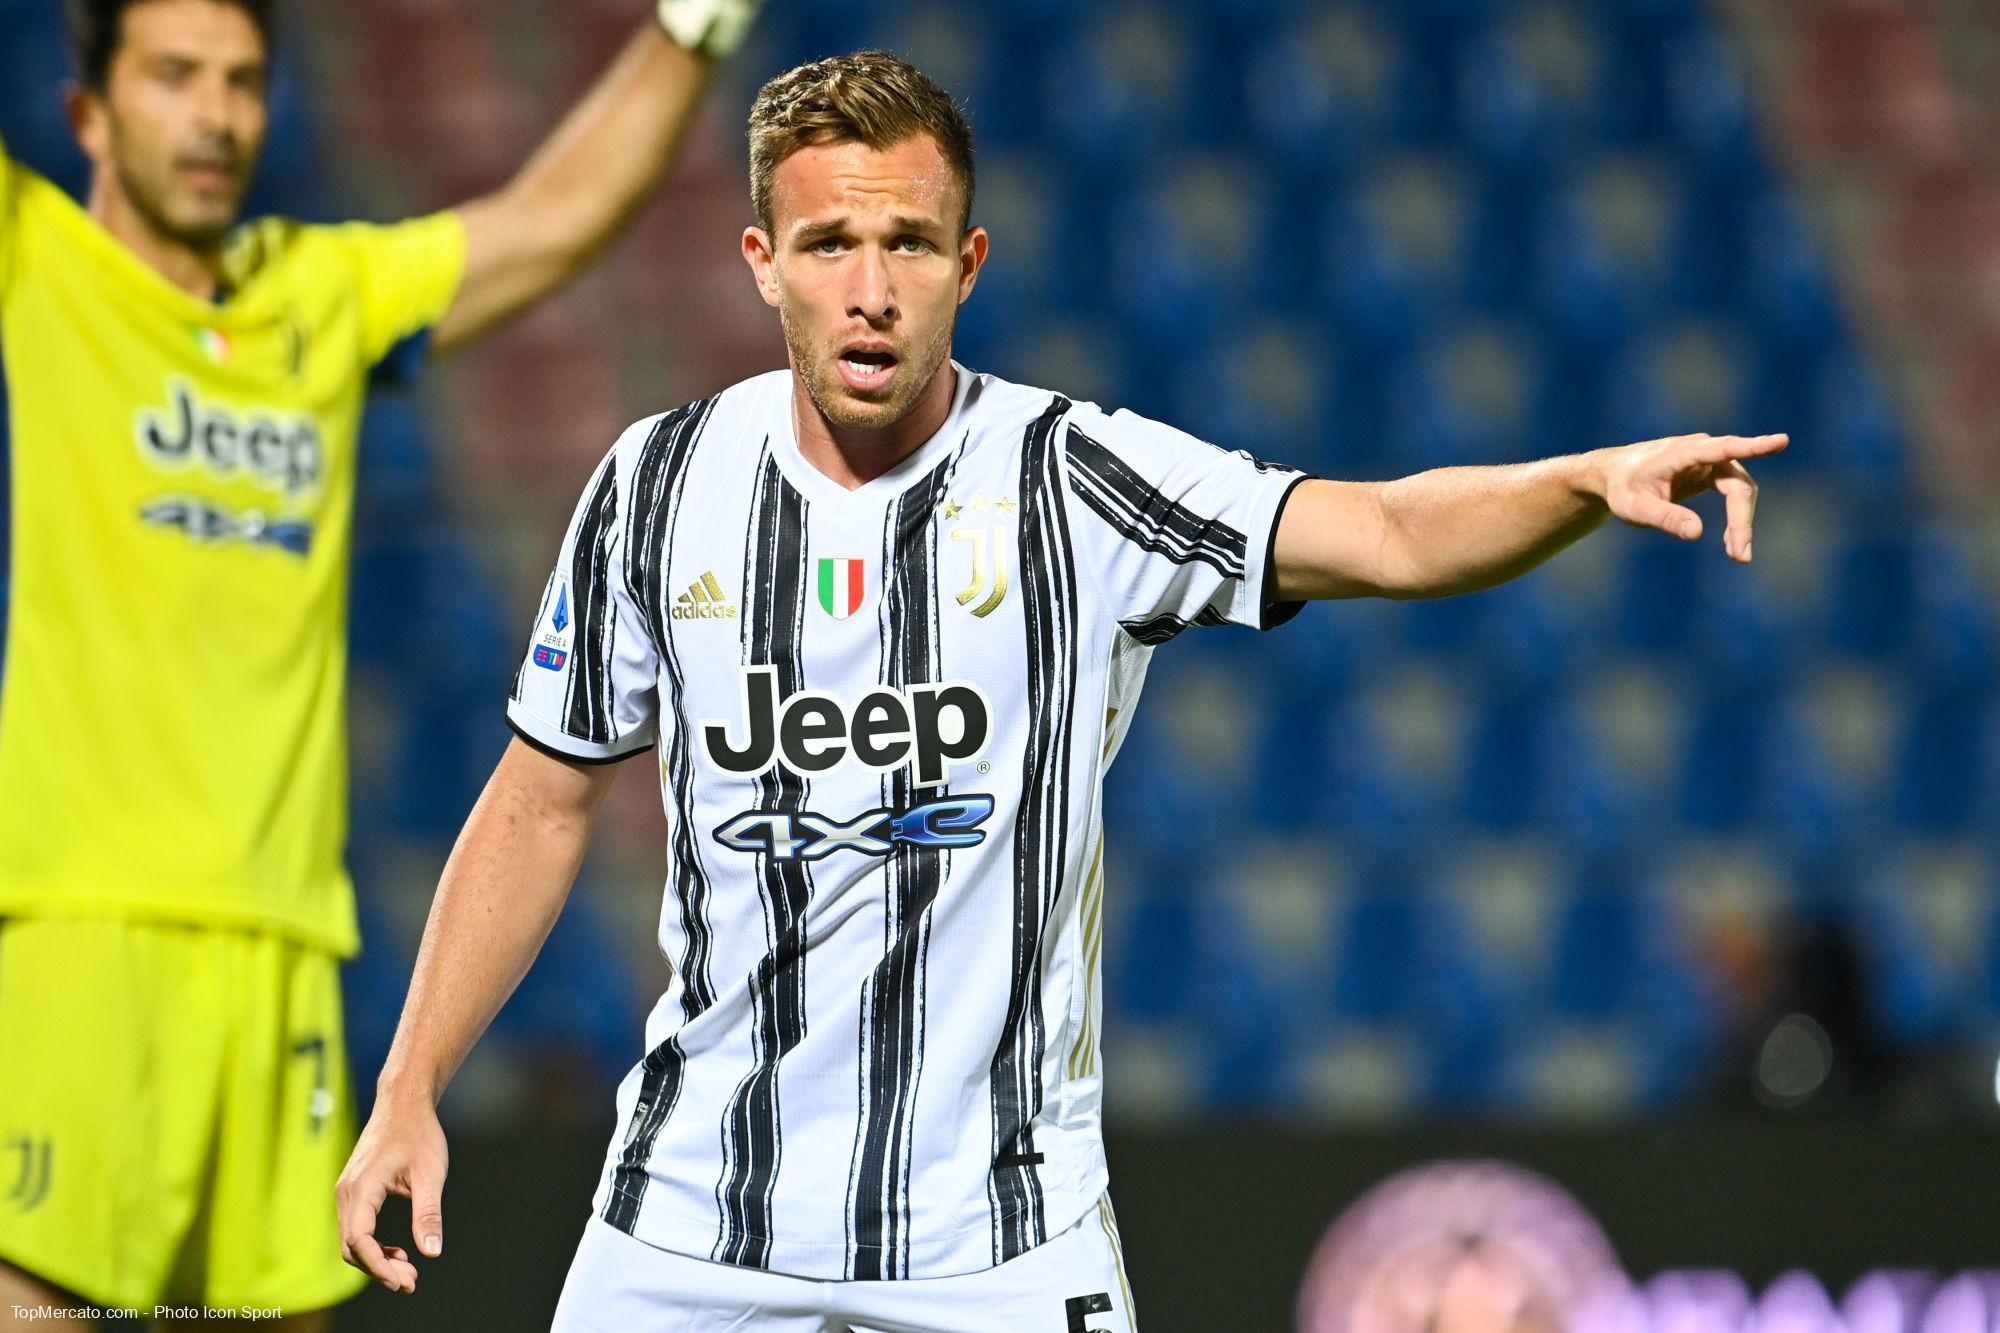 Arthur, Juventus de Turin